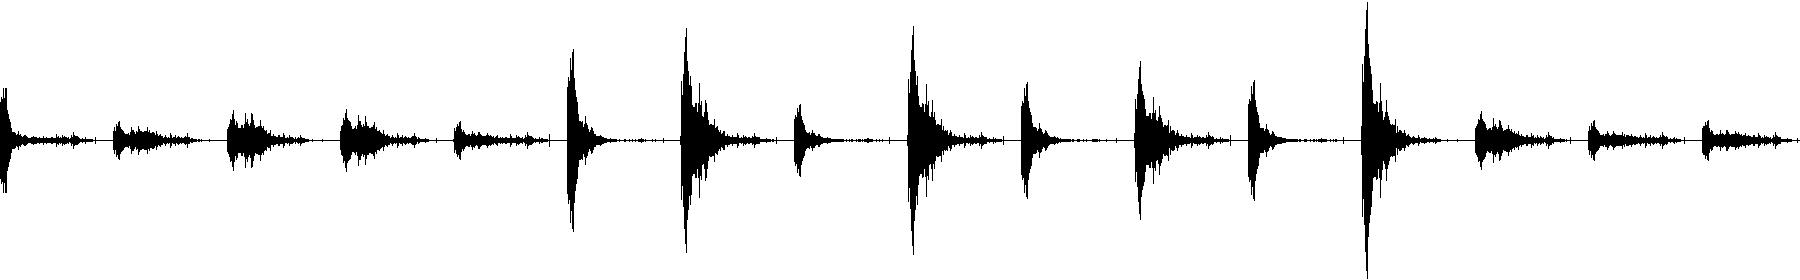 bluezone bc0210 percussion loop 003 110